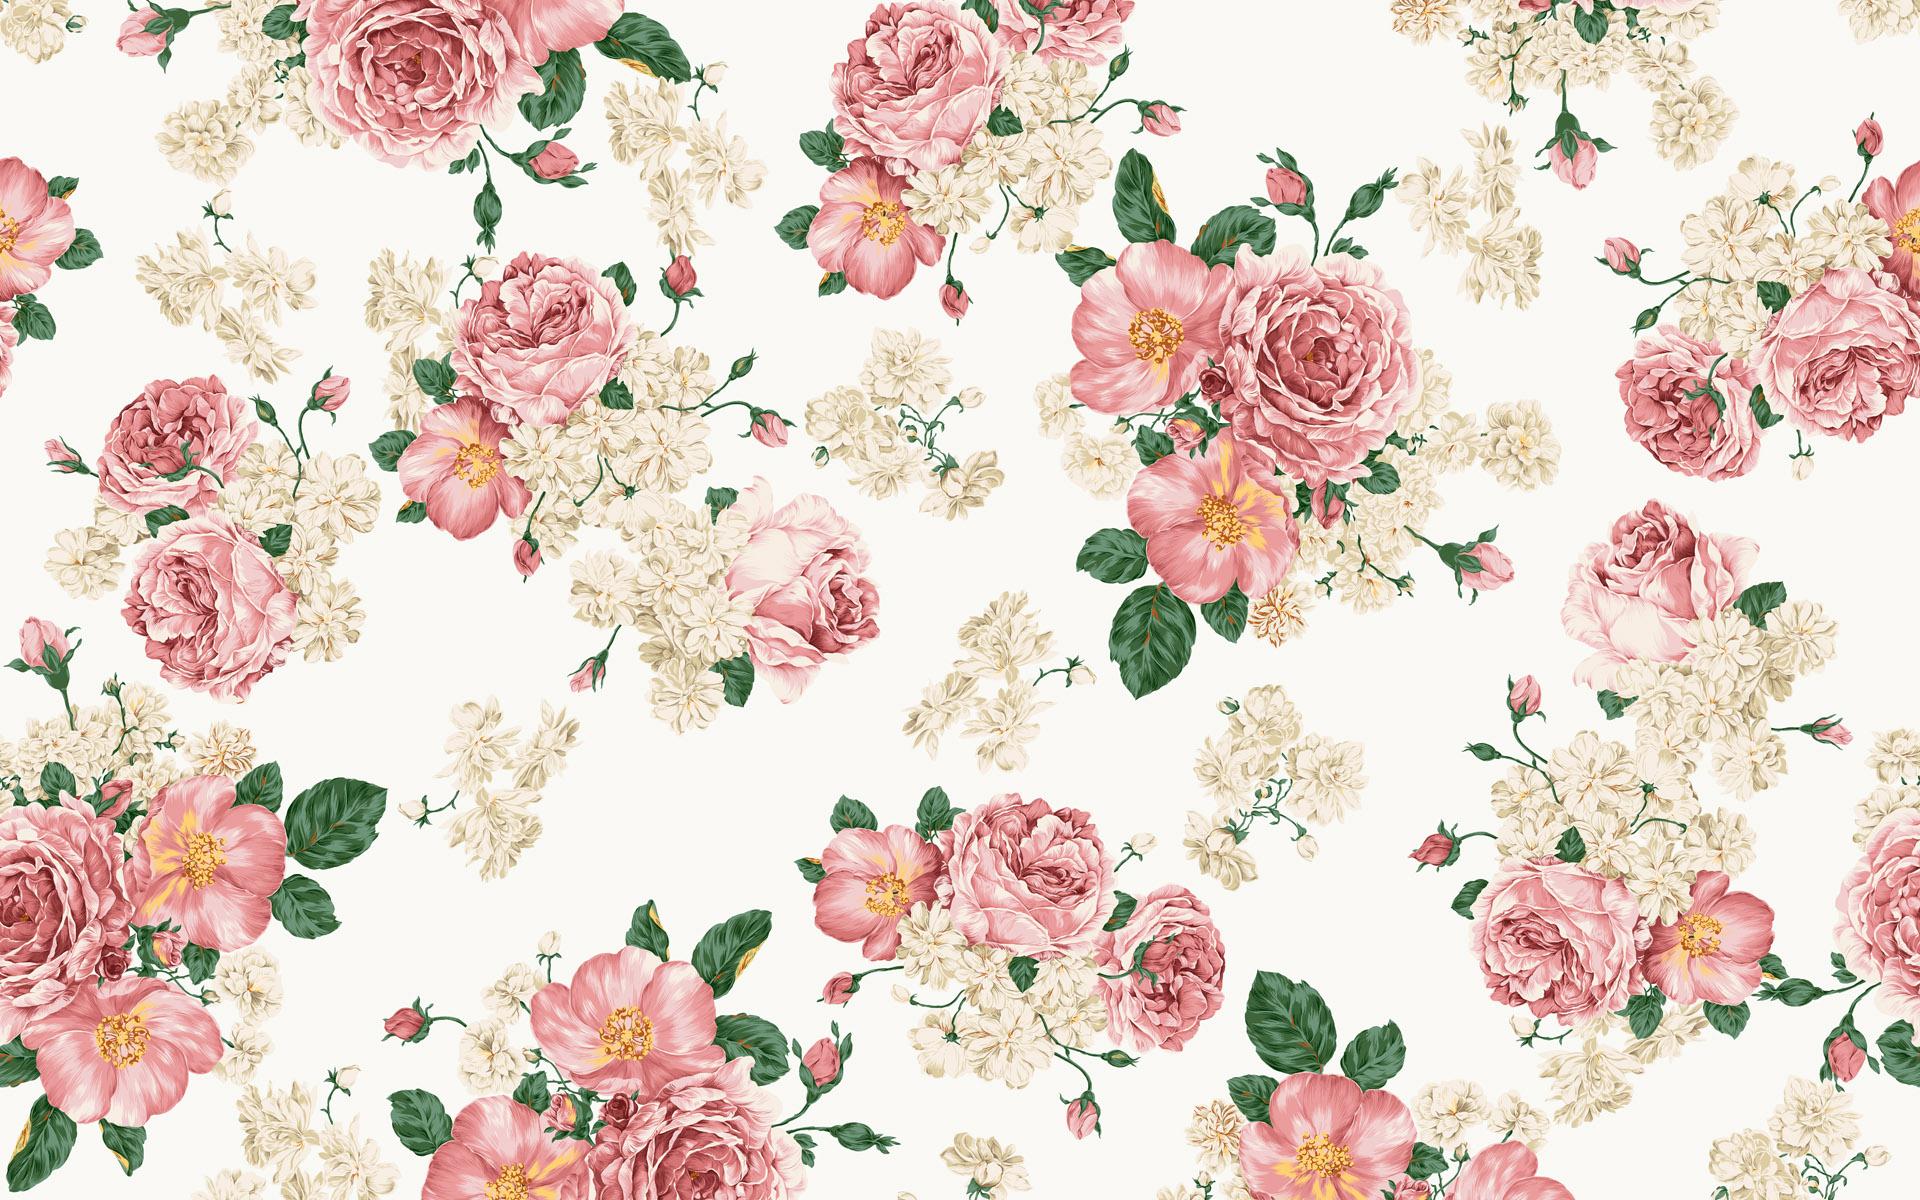 Wallpaper Background Cute Anime Vintage Rose Wallpaper Hd Desktop Wallpapers 4k Hd